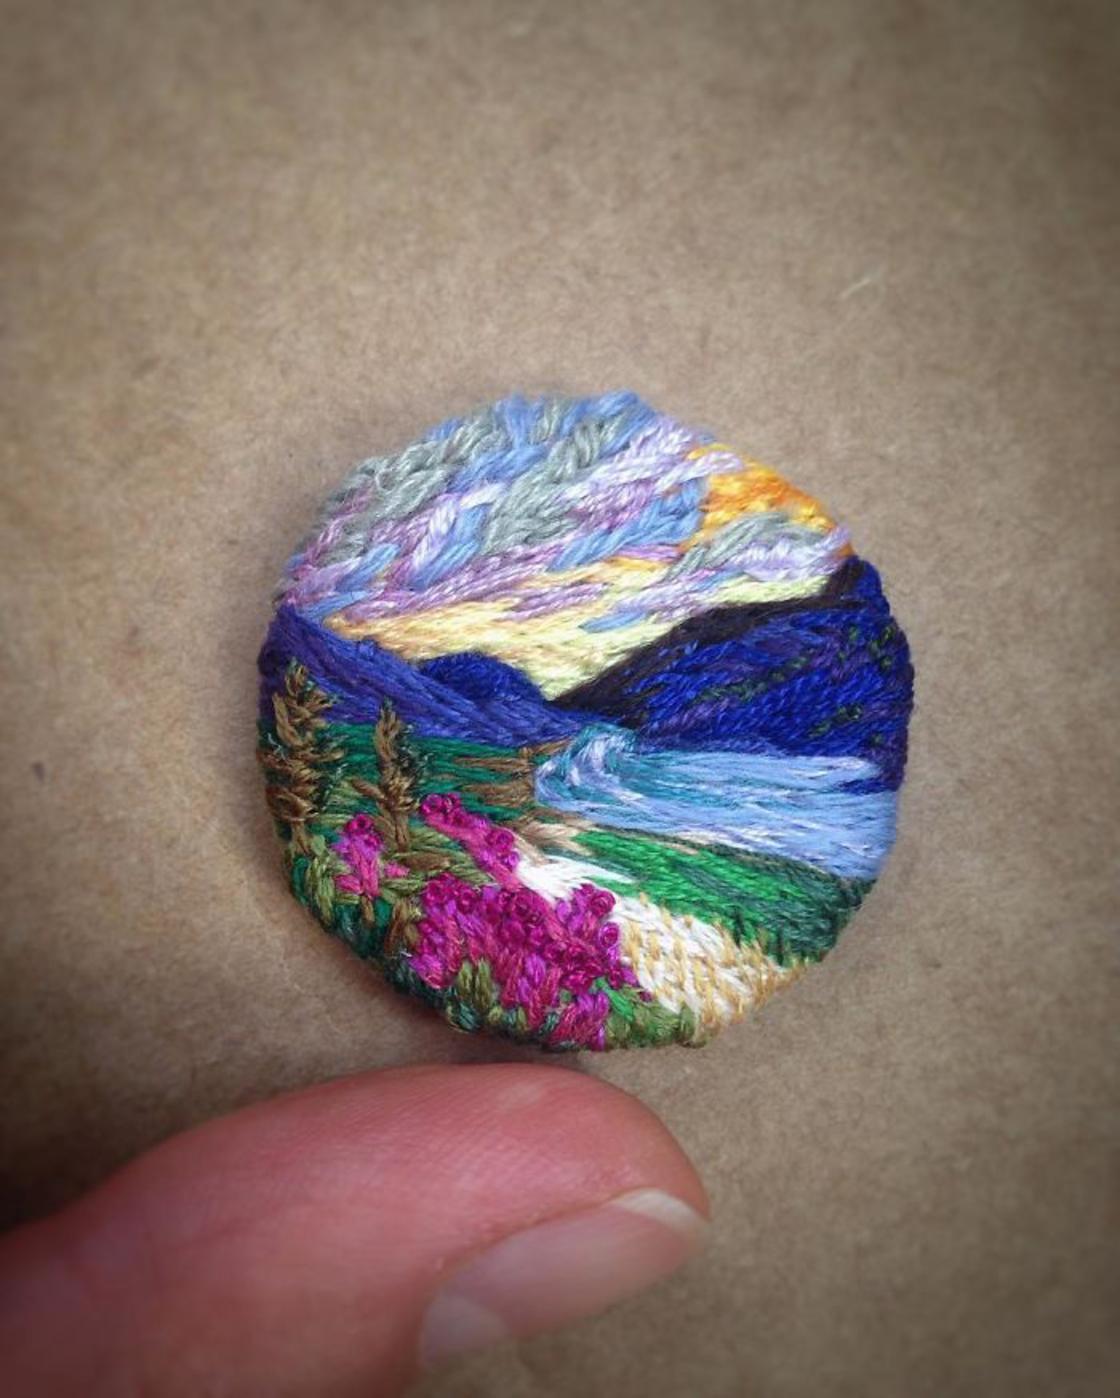 Colorful Landscapes – The impressive embroidery by Vera Shimunia